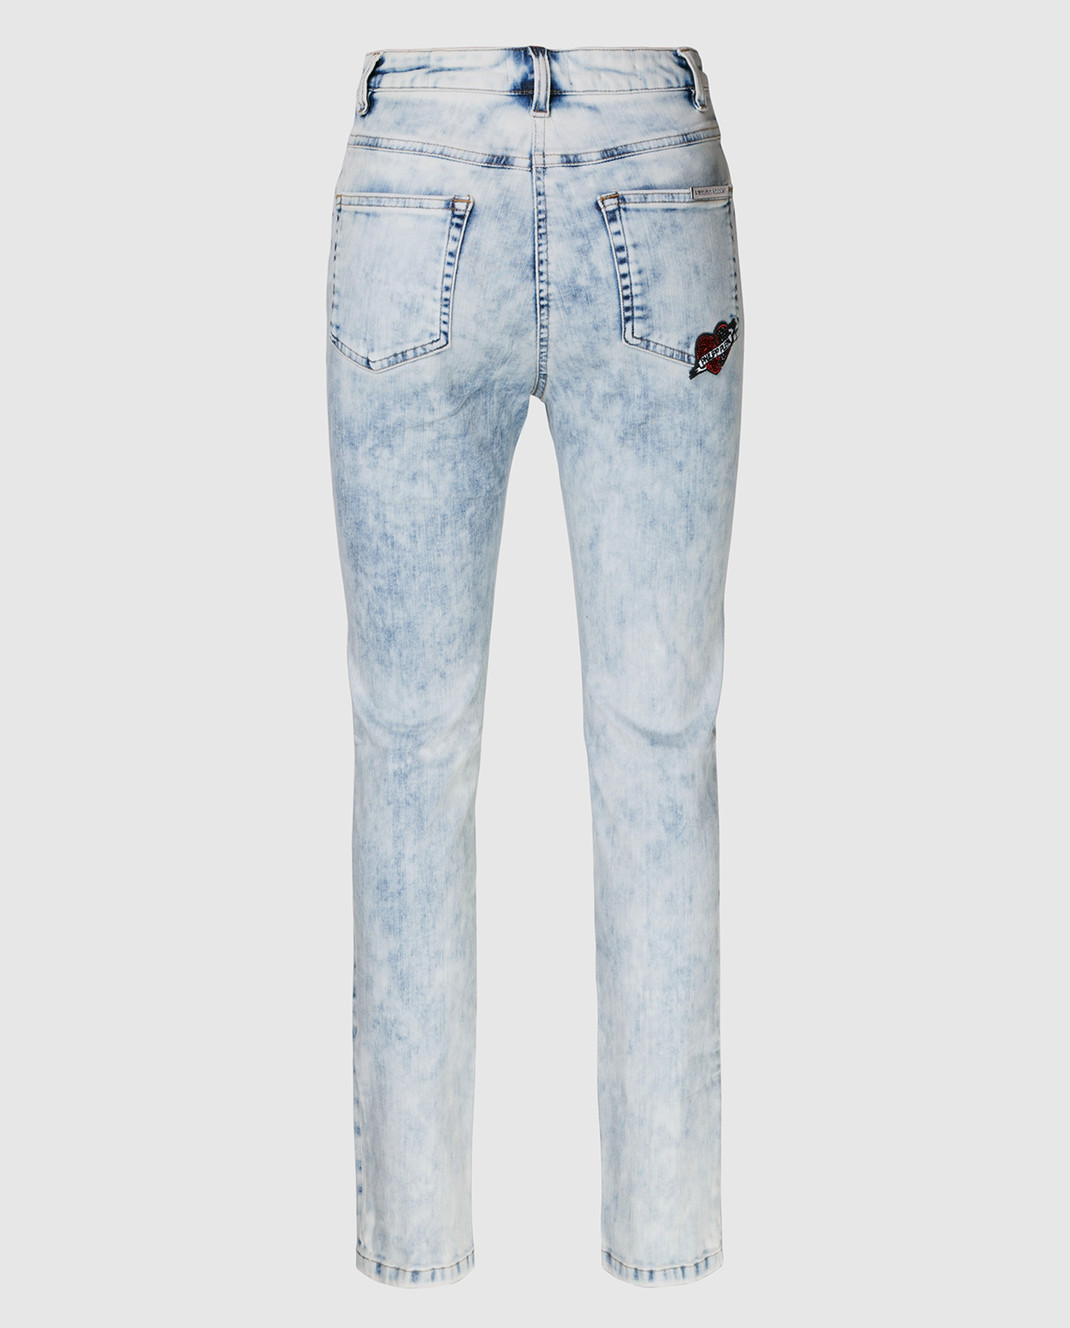 Philipp Plein Голубые джинсы WDT0368 изображение 2